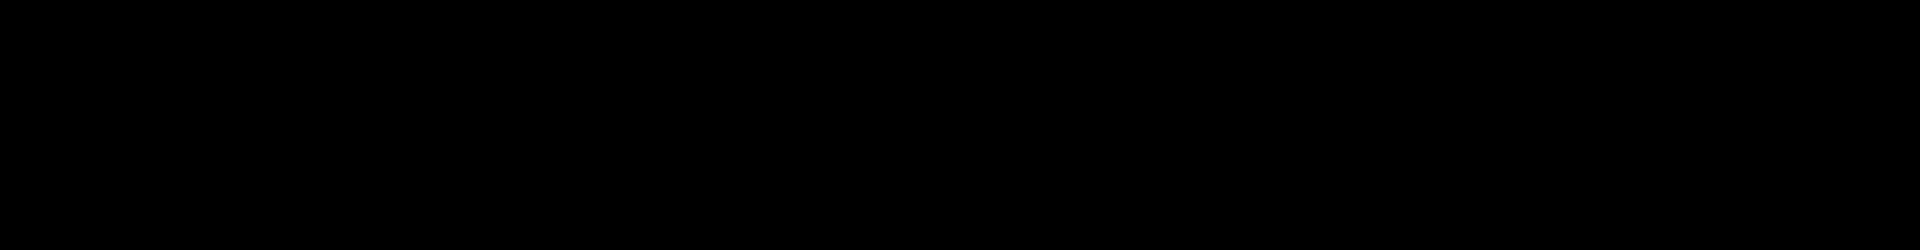 rc logo header.png